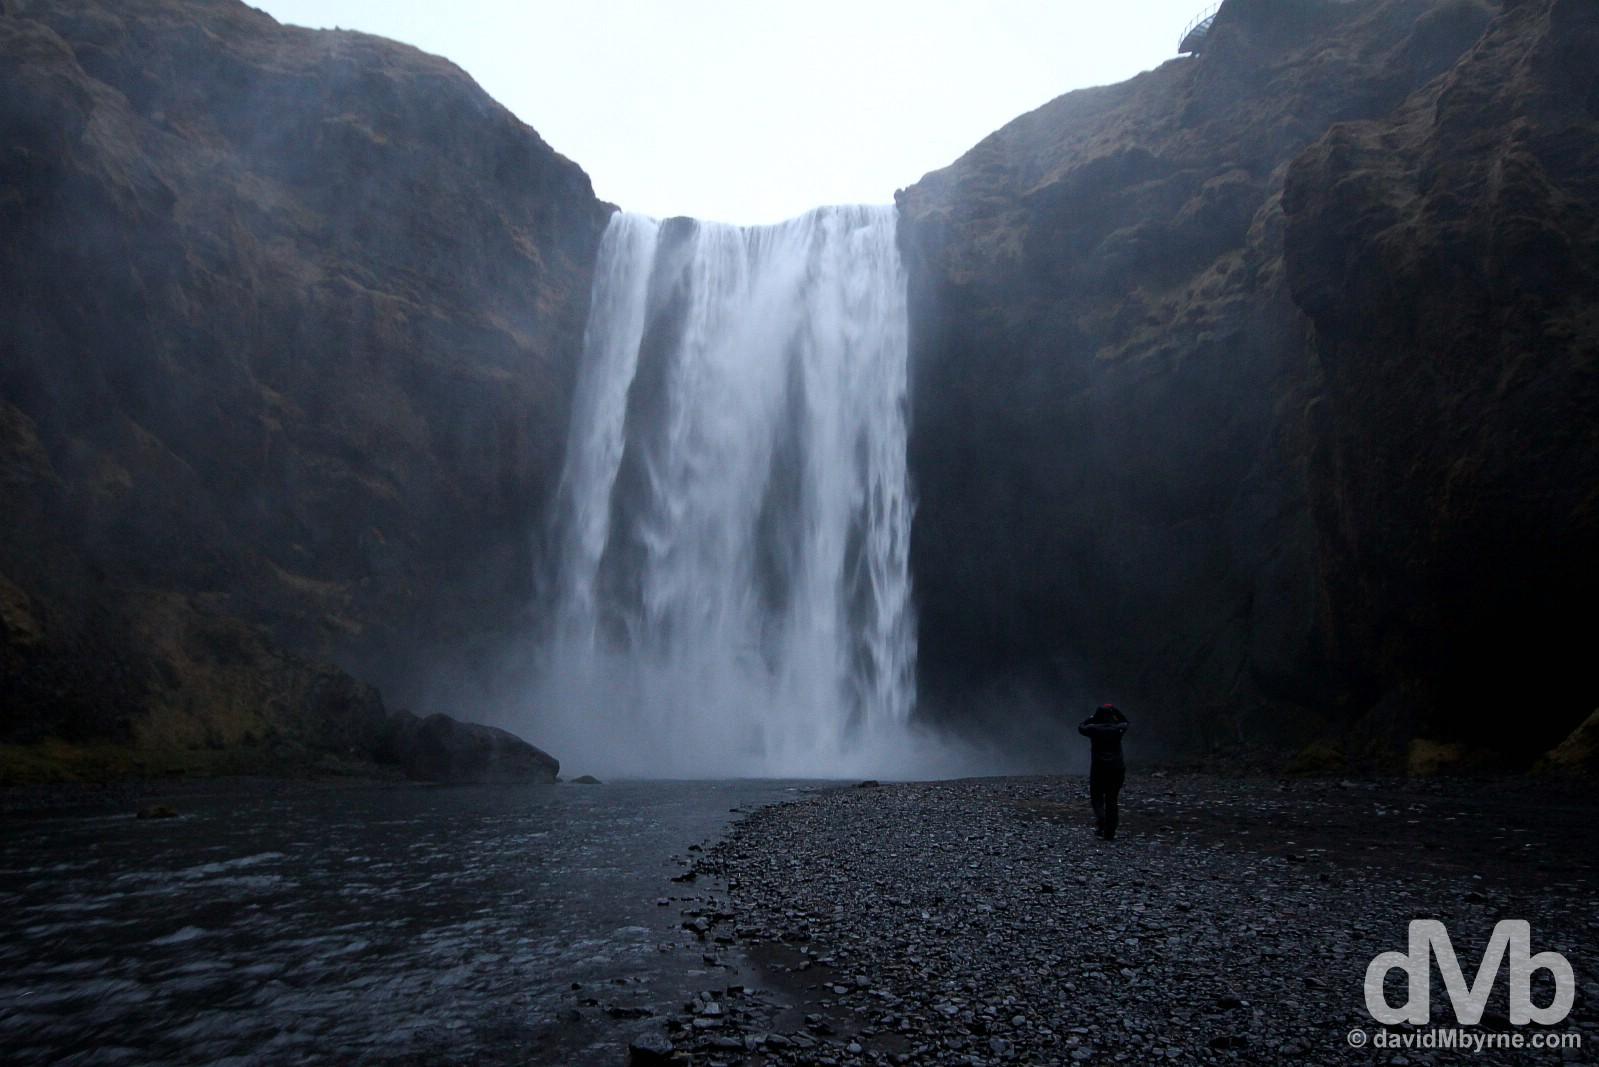 Skógafoss Waterfall, southern Iceland. December 5, 2012.